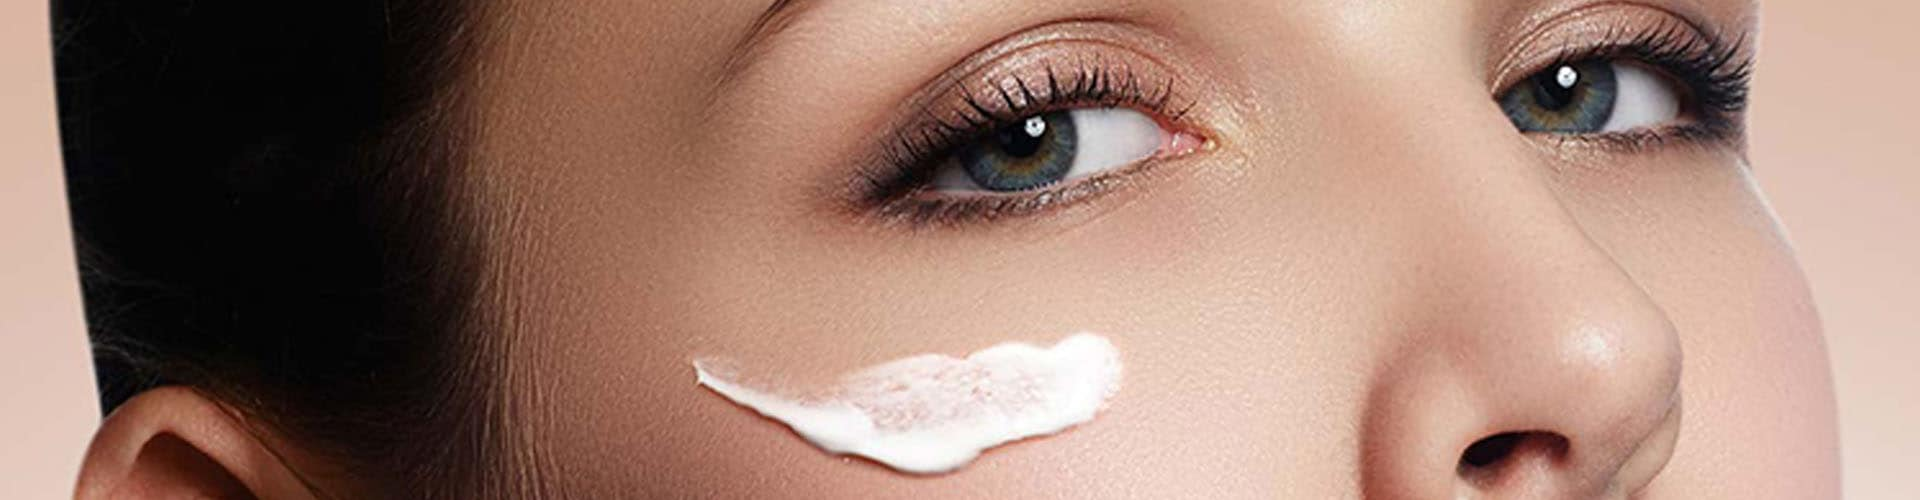 Best Drugstore Eye Cream 2019 – Buyer's Guide and Eye Cream Reviews